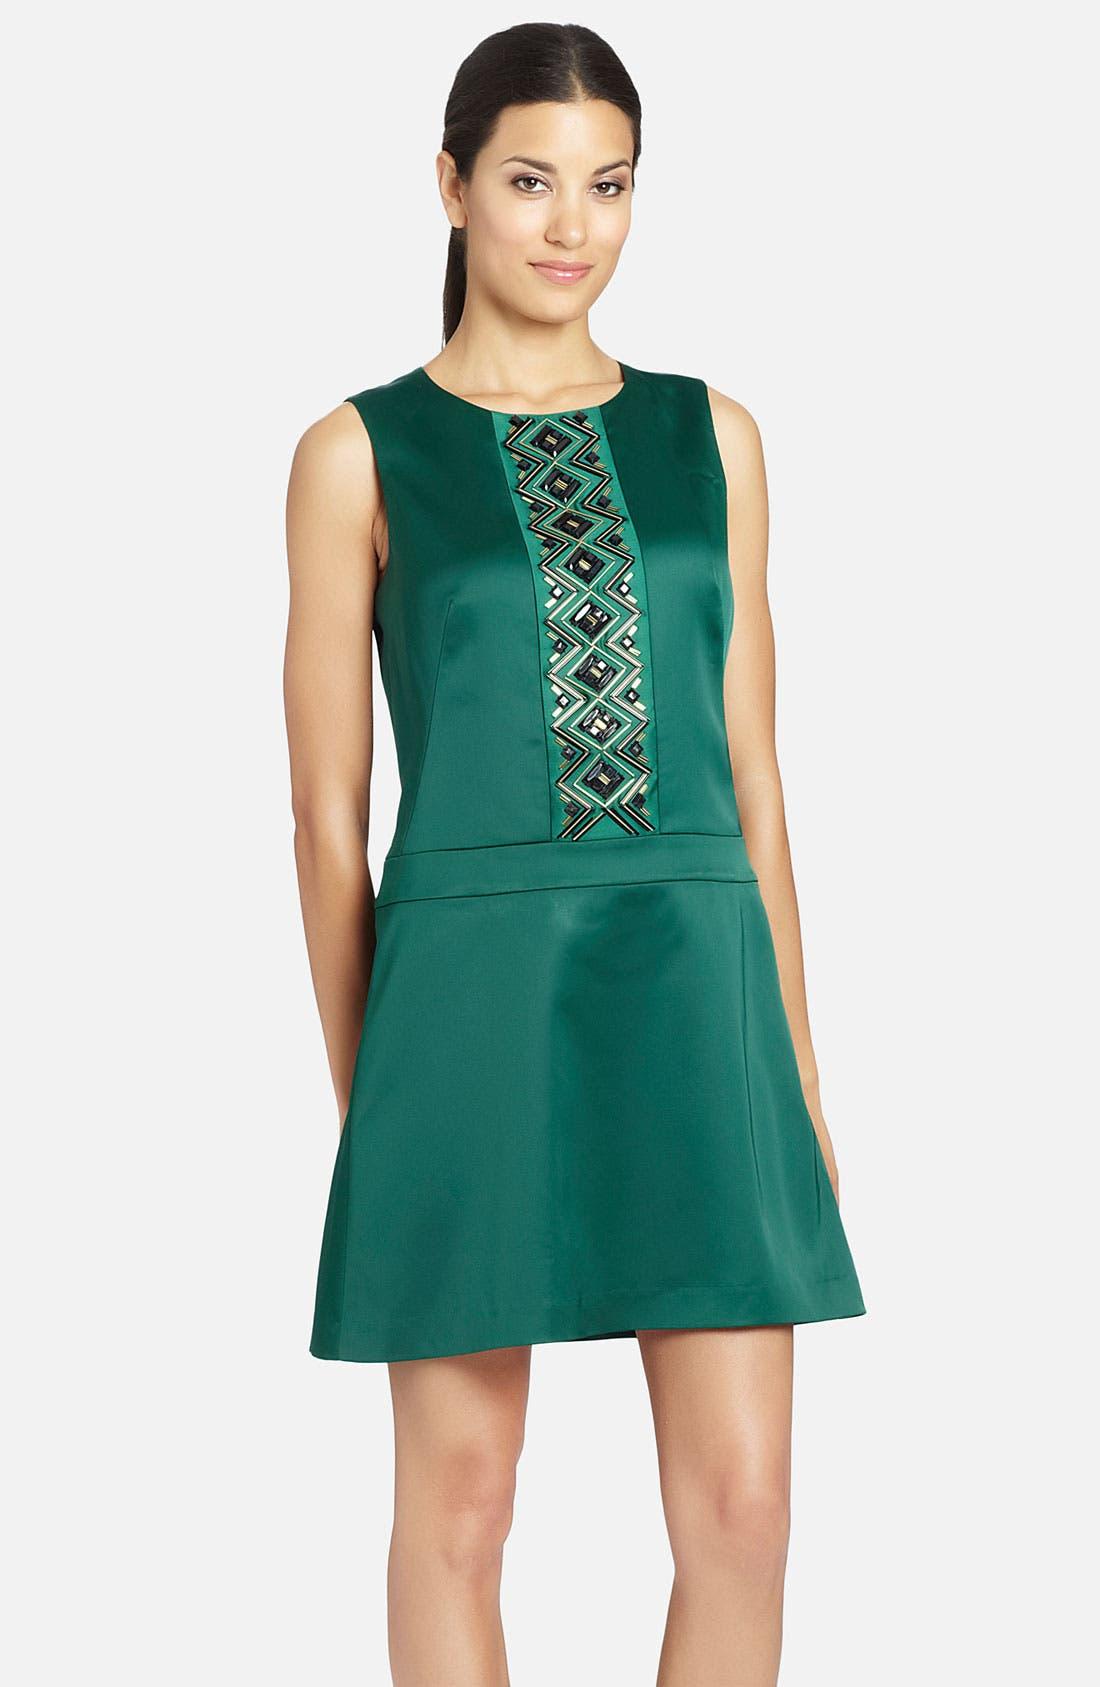 Alternate Image 1 Selected - Cynthia Steffe 'Ava' Art Deco Pattern Satin Dress